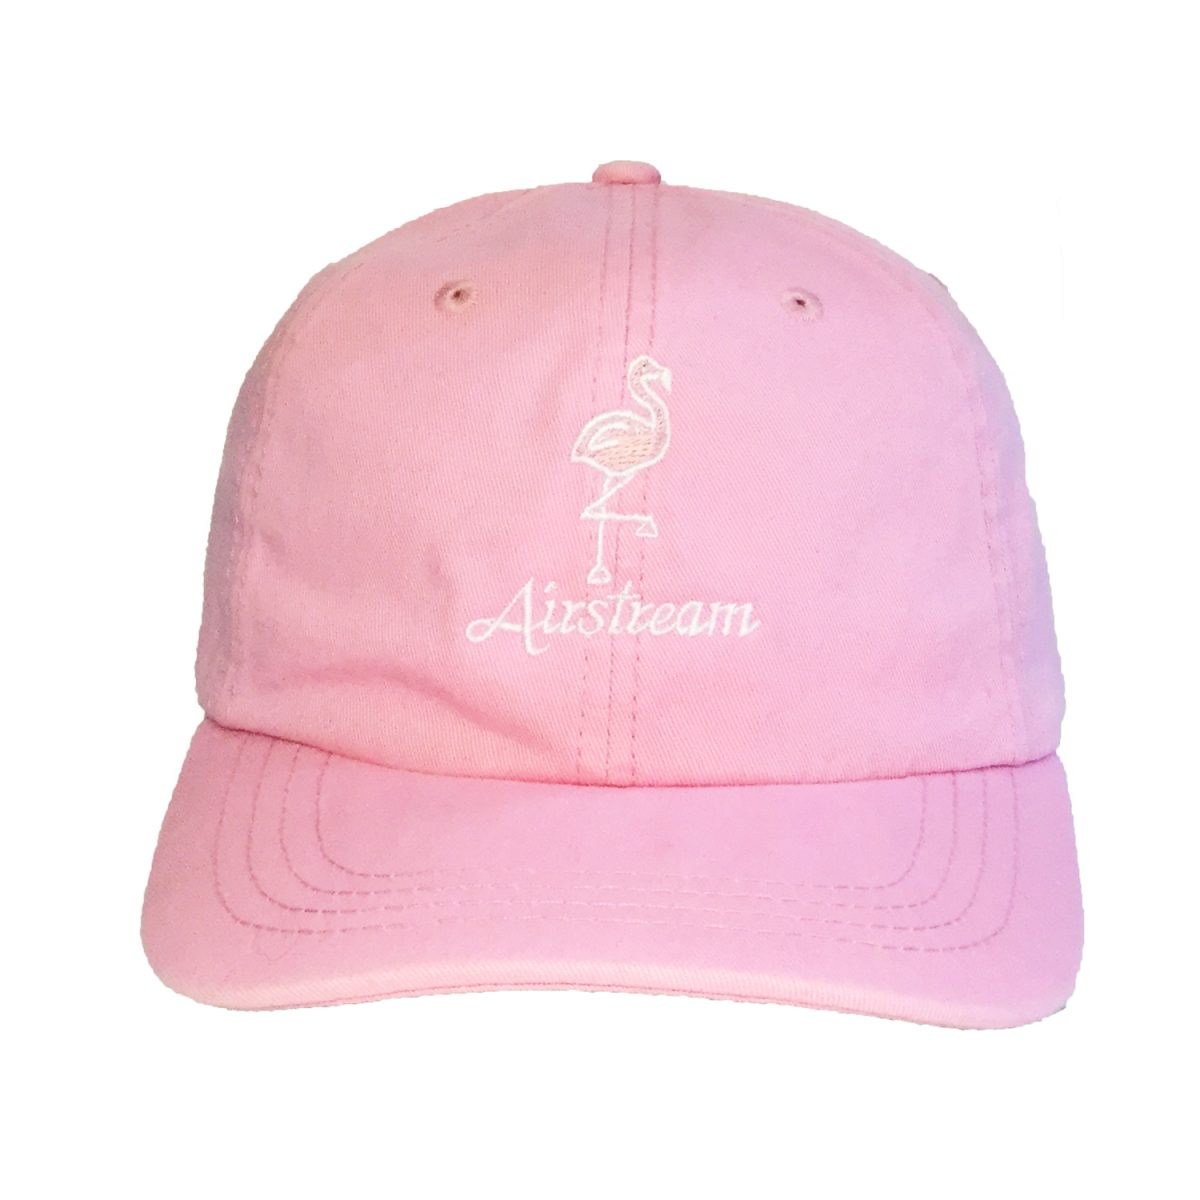 airstream flamingo pink hat